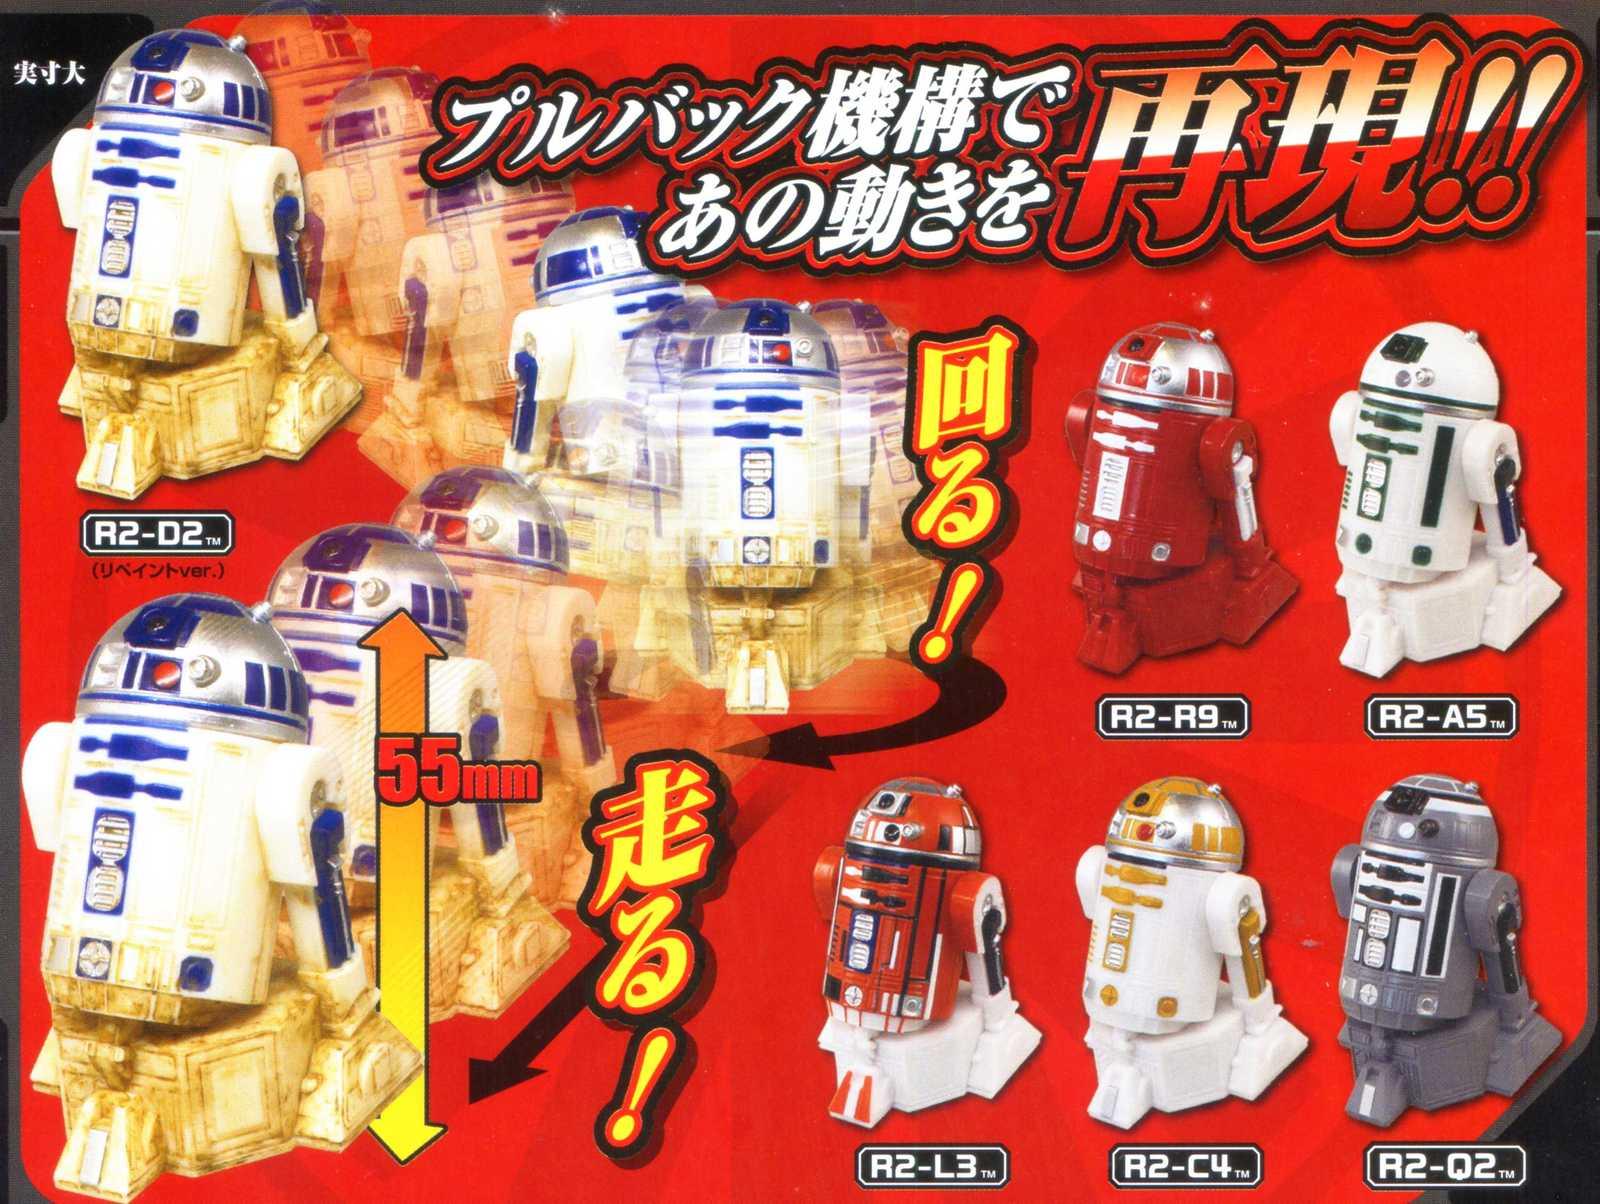 TAKARA TOMY ARTS STAR WARS Characters GACHA GALAXY PULLBACK DROID Phase 2 R2-L3